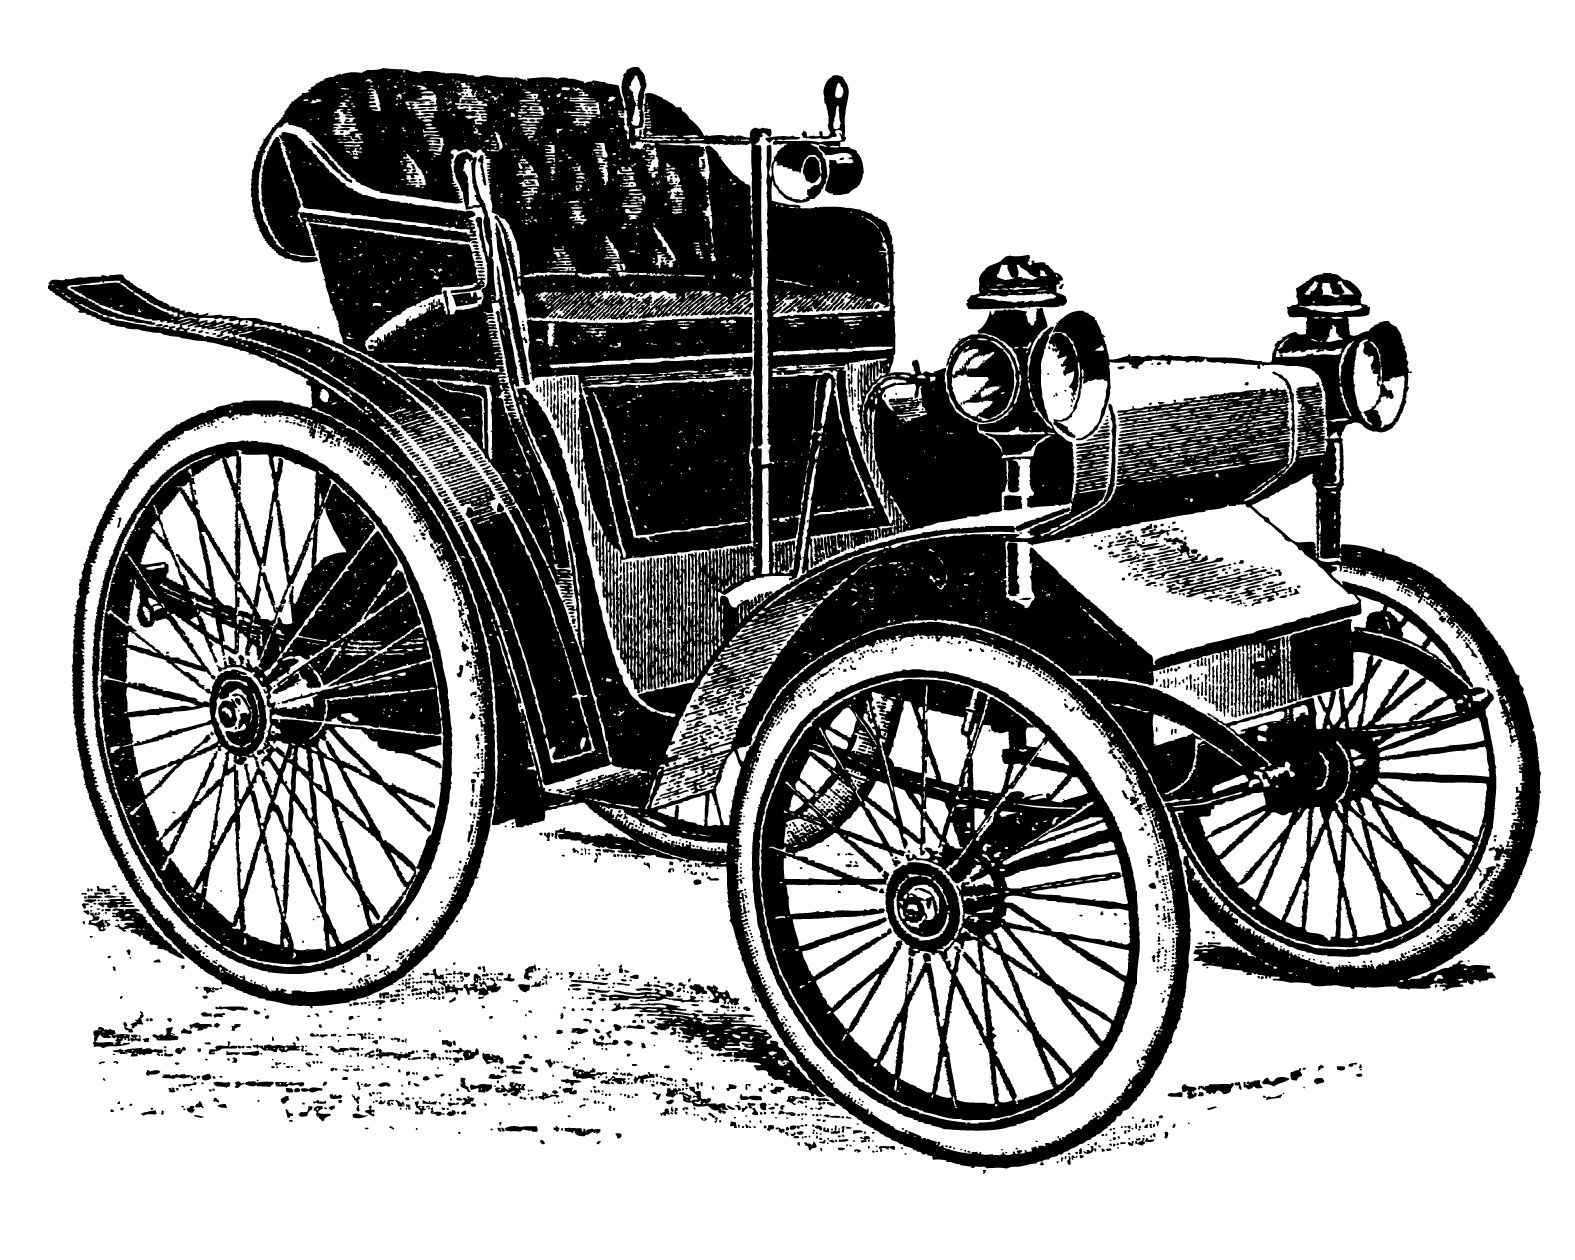 Vintage car clipart images clipart royalty free stock Free vintage clip art images: Vintage cars and coaches clip art ... clipart royalty free stock